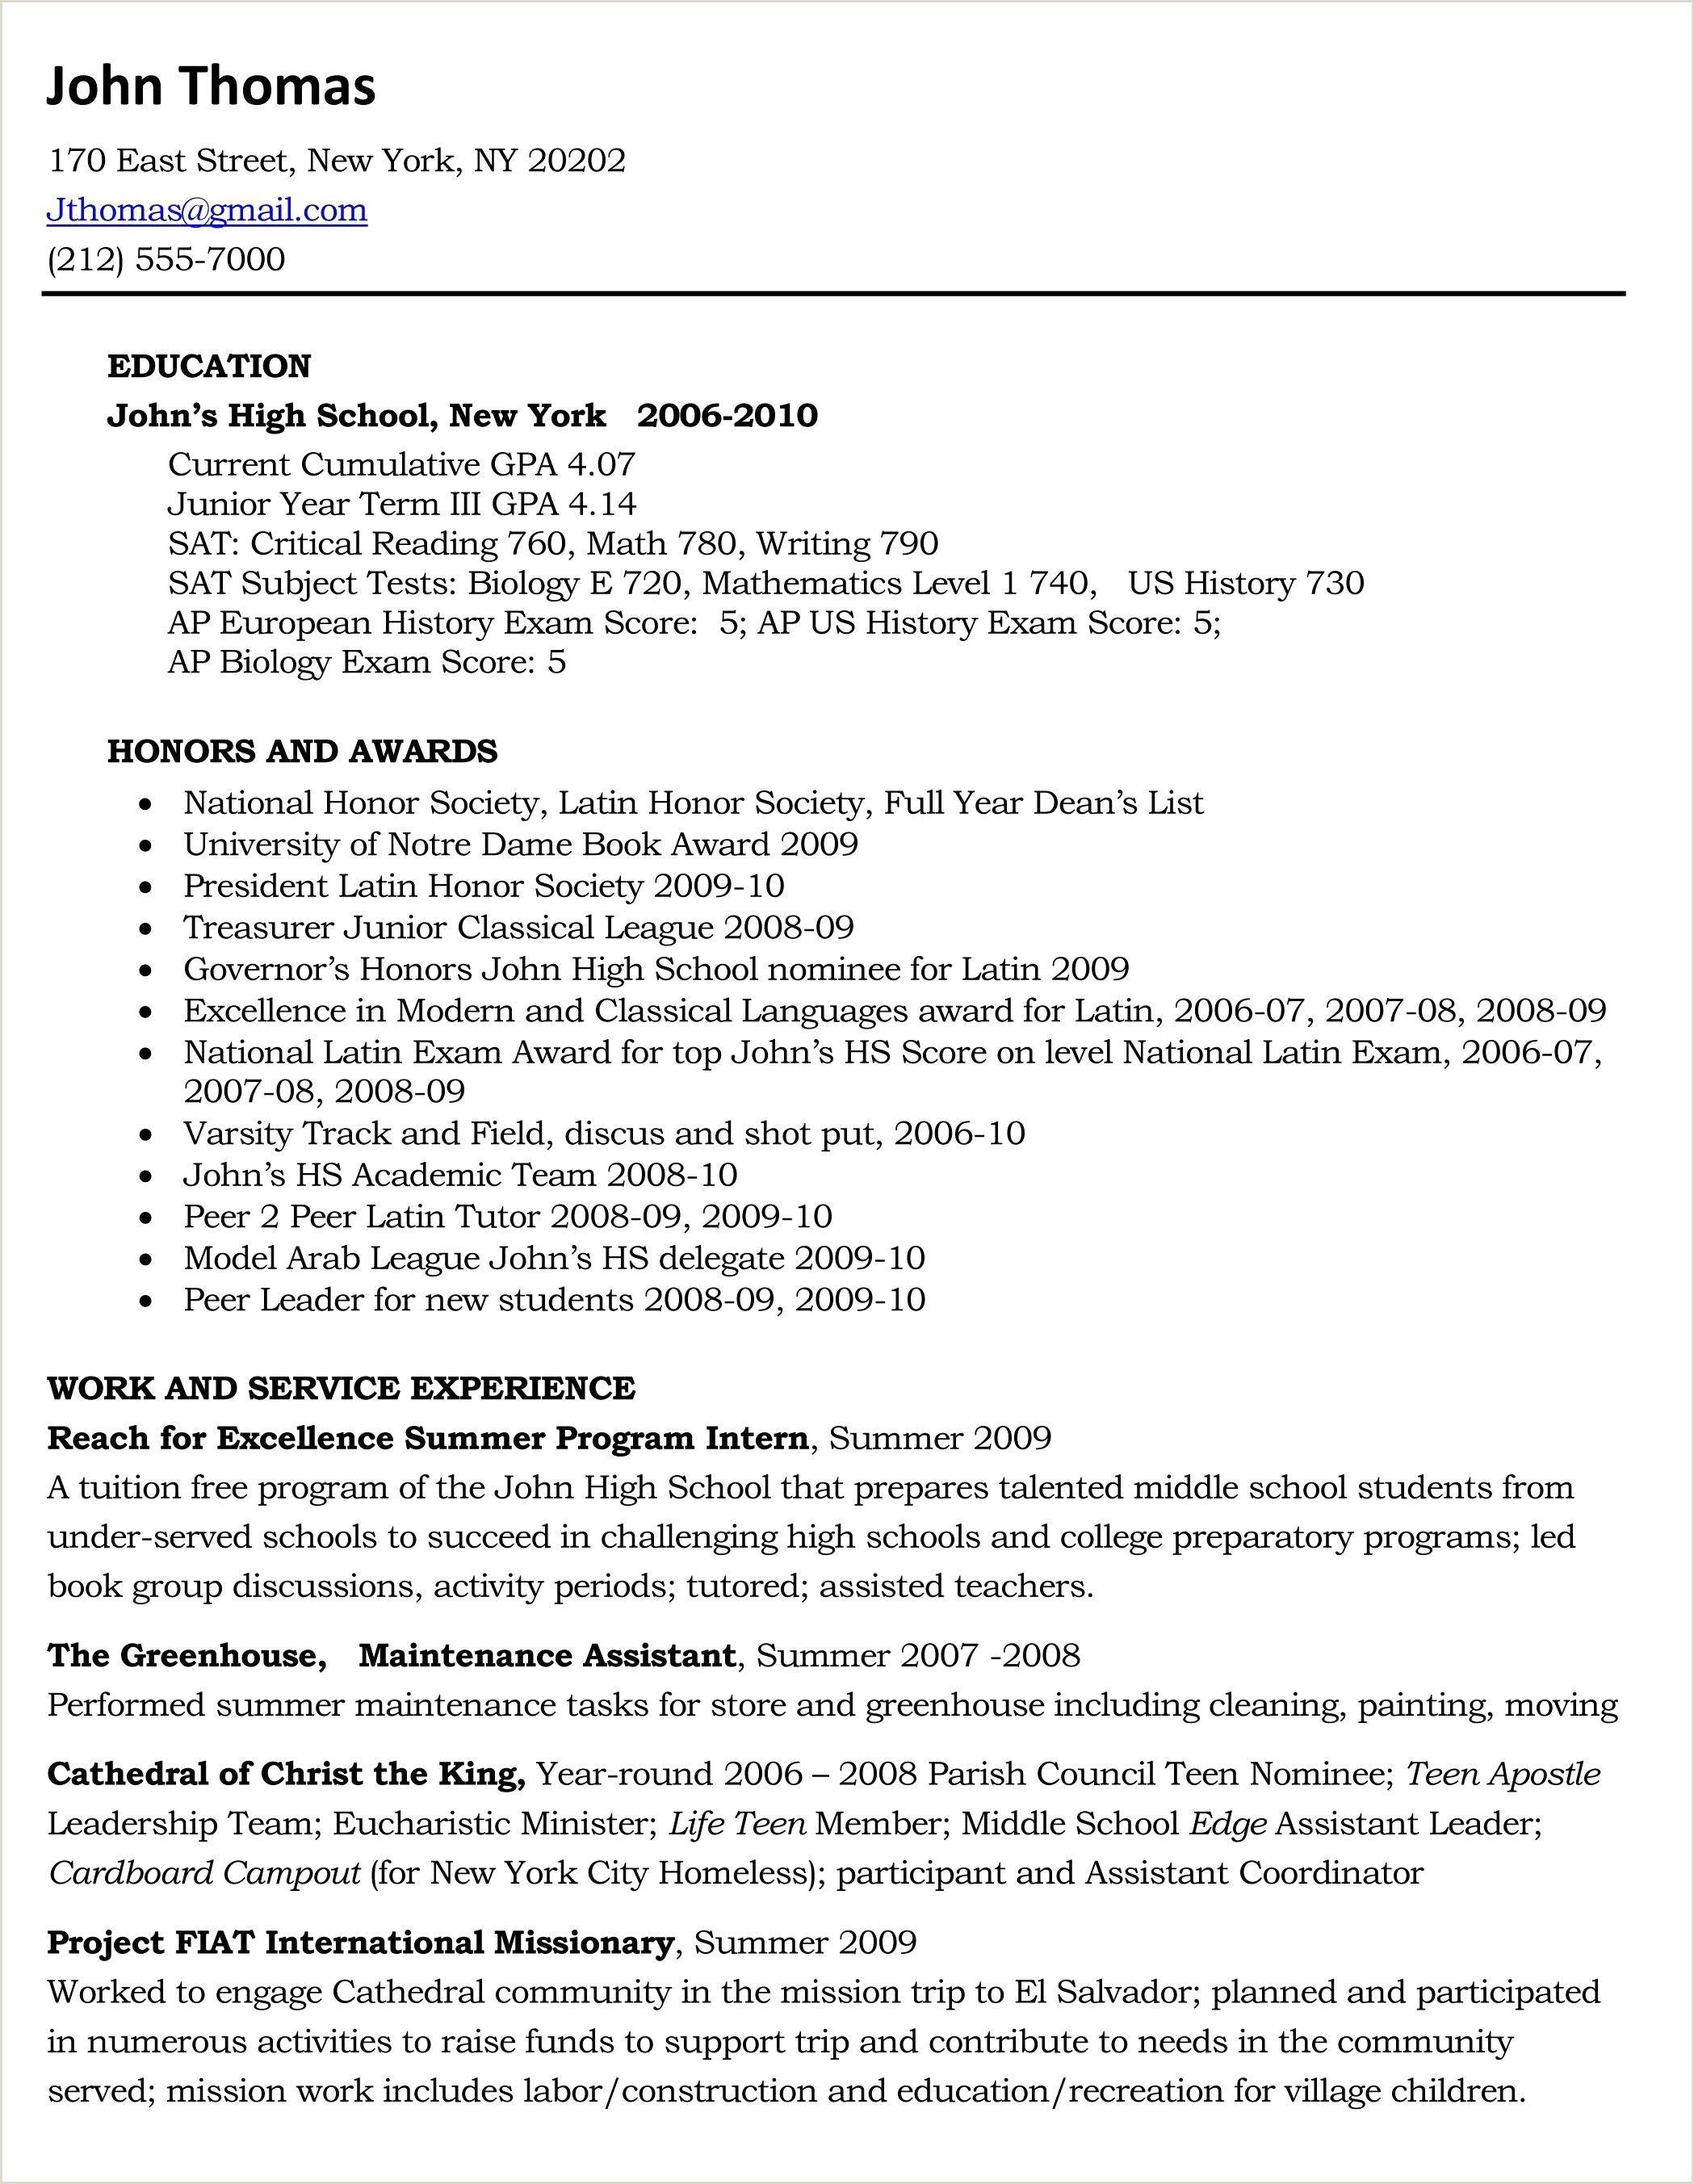 Sample Resume Xls Format 3 Resume Format